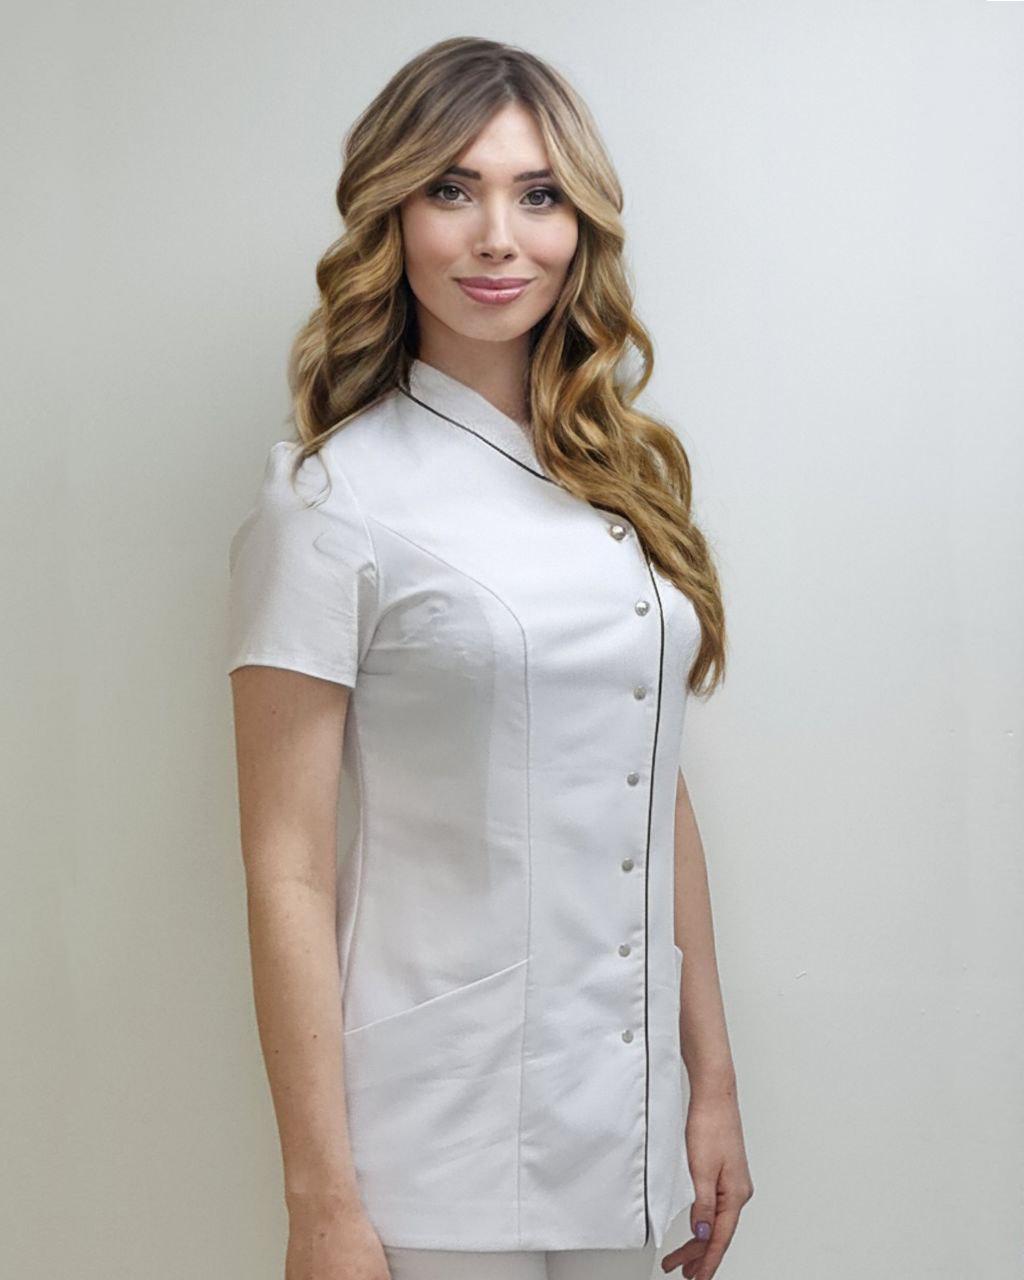 Швецова Наталья Владимировна